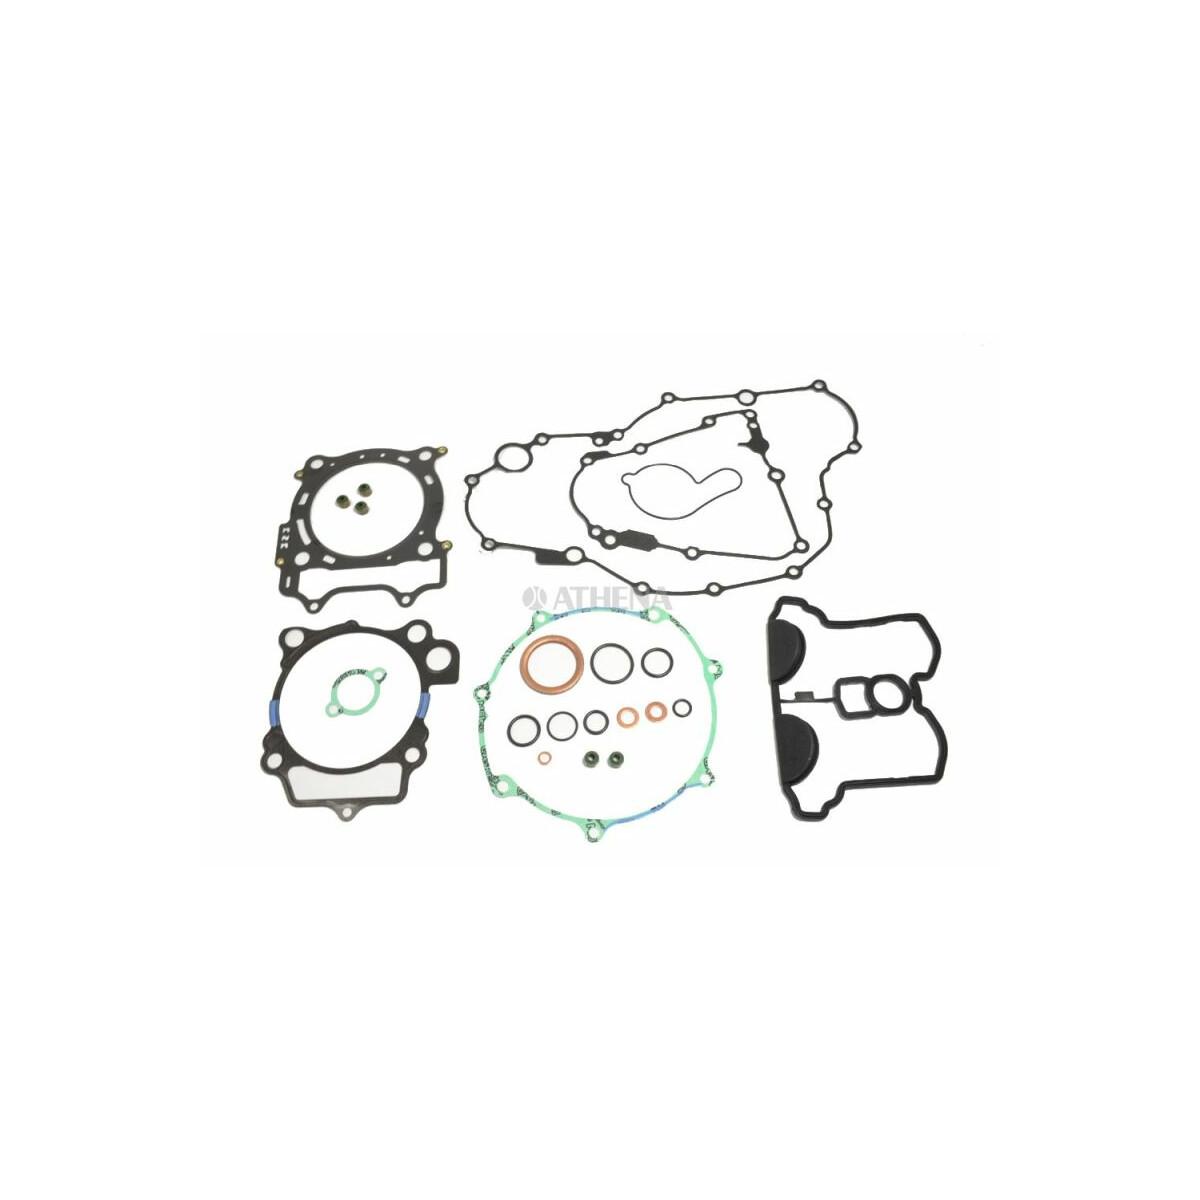 KR Motordichtsatz Dichtsatz komplett YAMAHA FZ1 1000 S Fazer 06-15 Gasket set